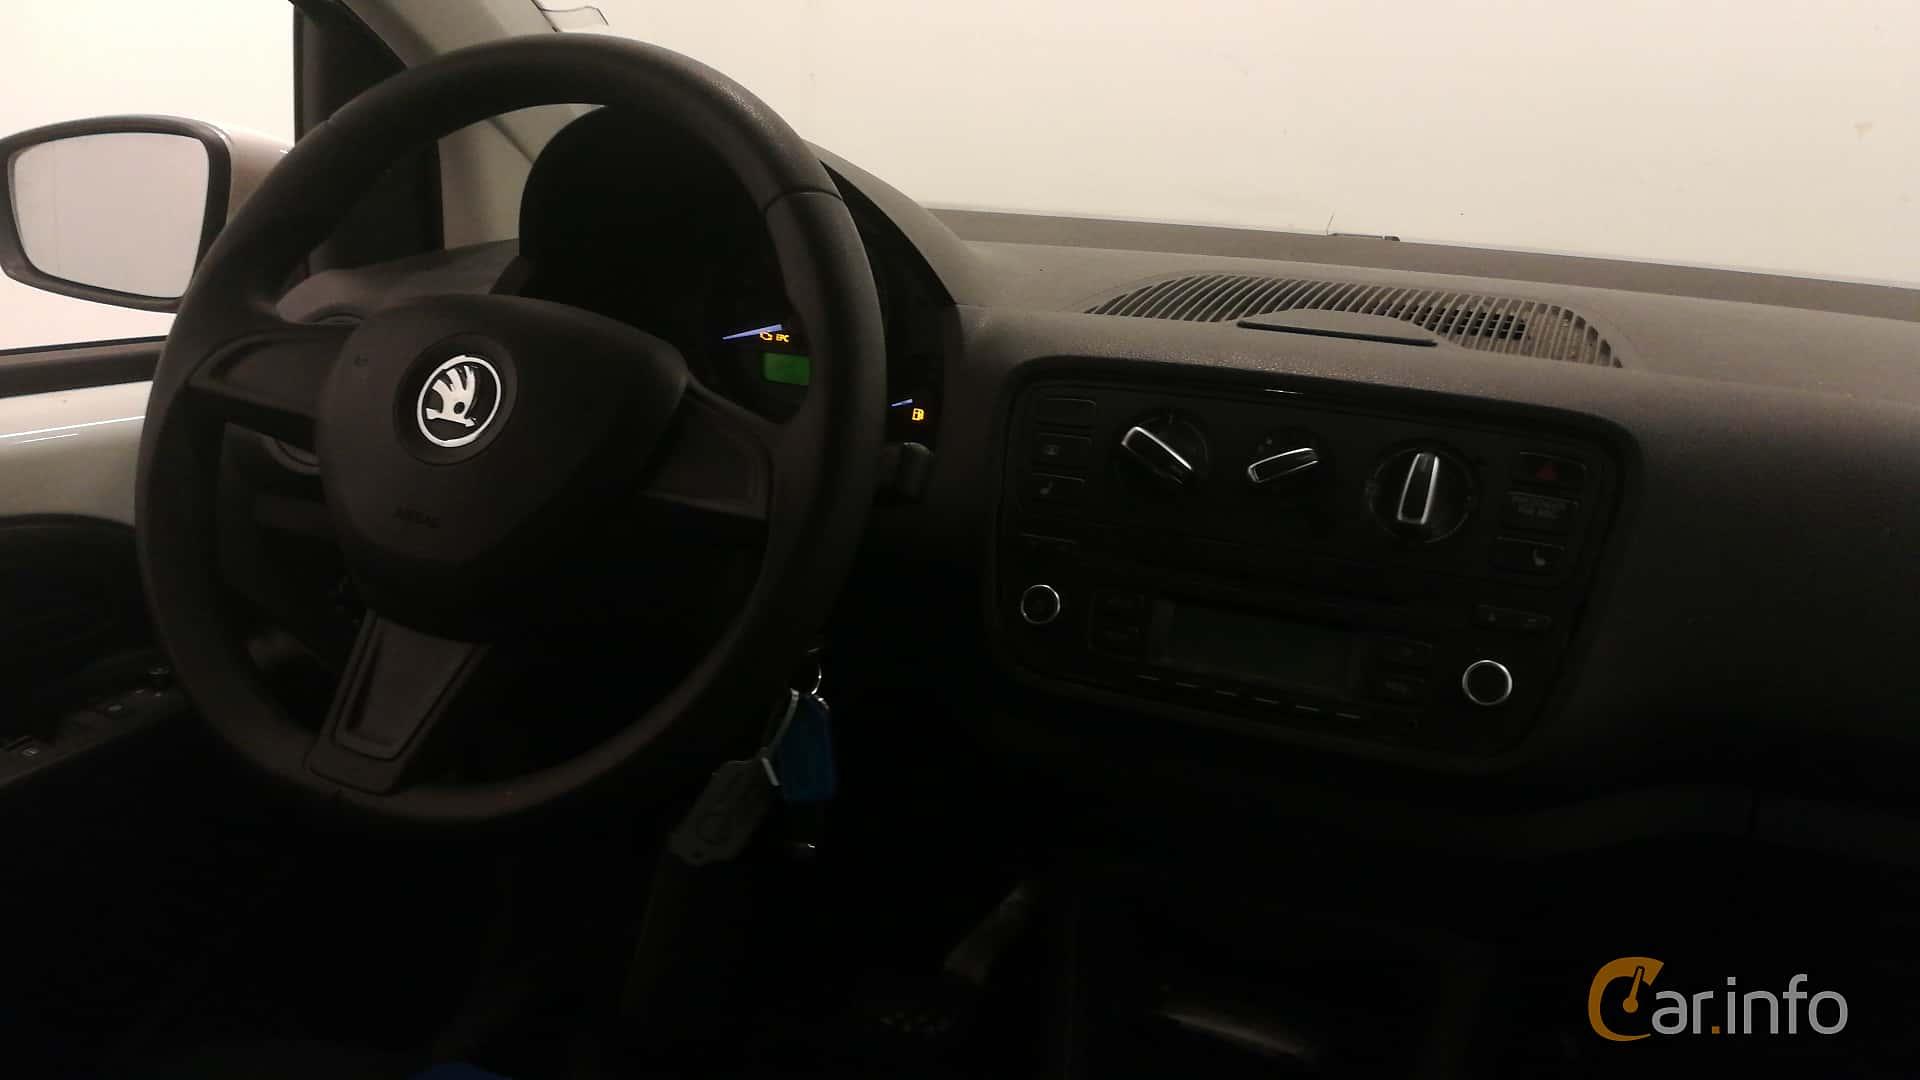 Skoda Citigo 3-door 1.0 MPI Automatic, 60hp, 2015